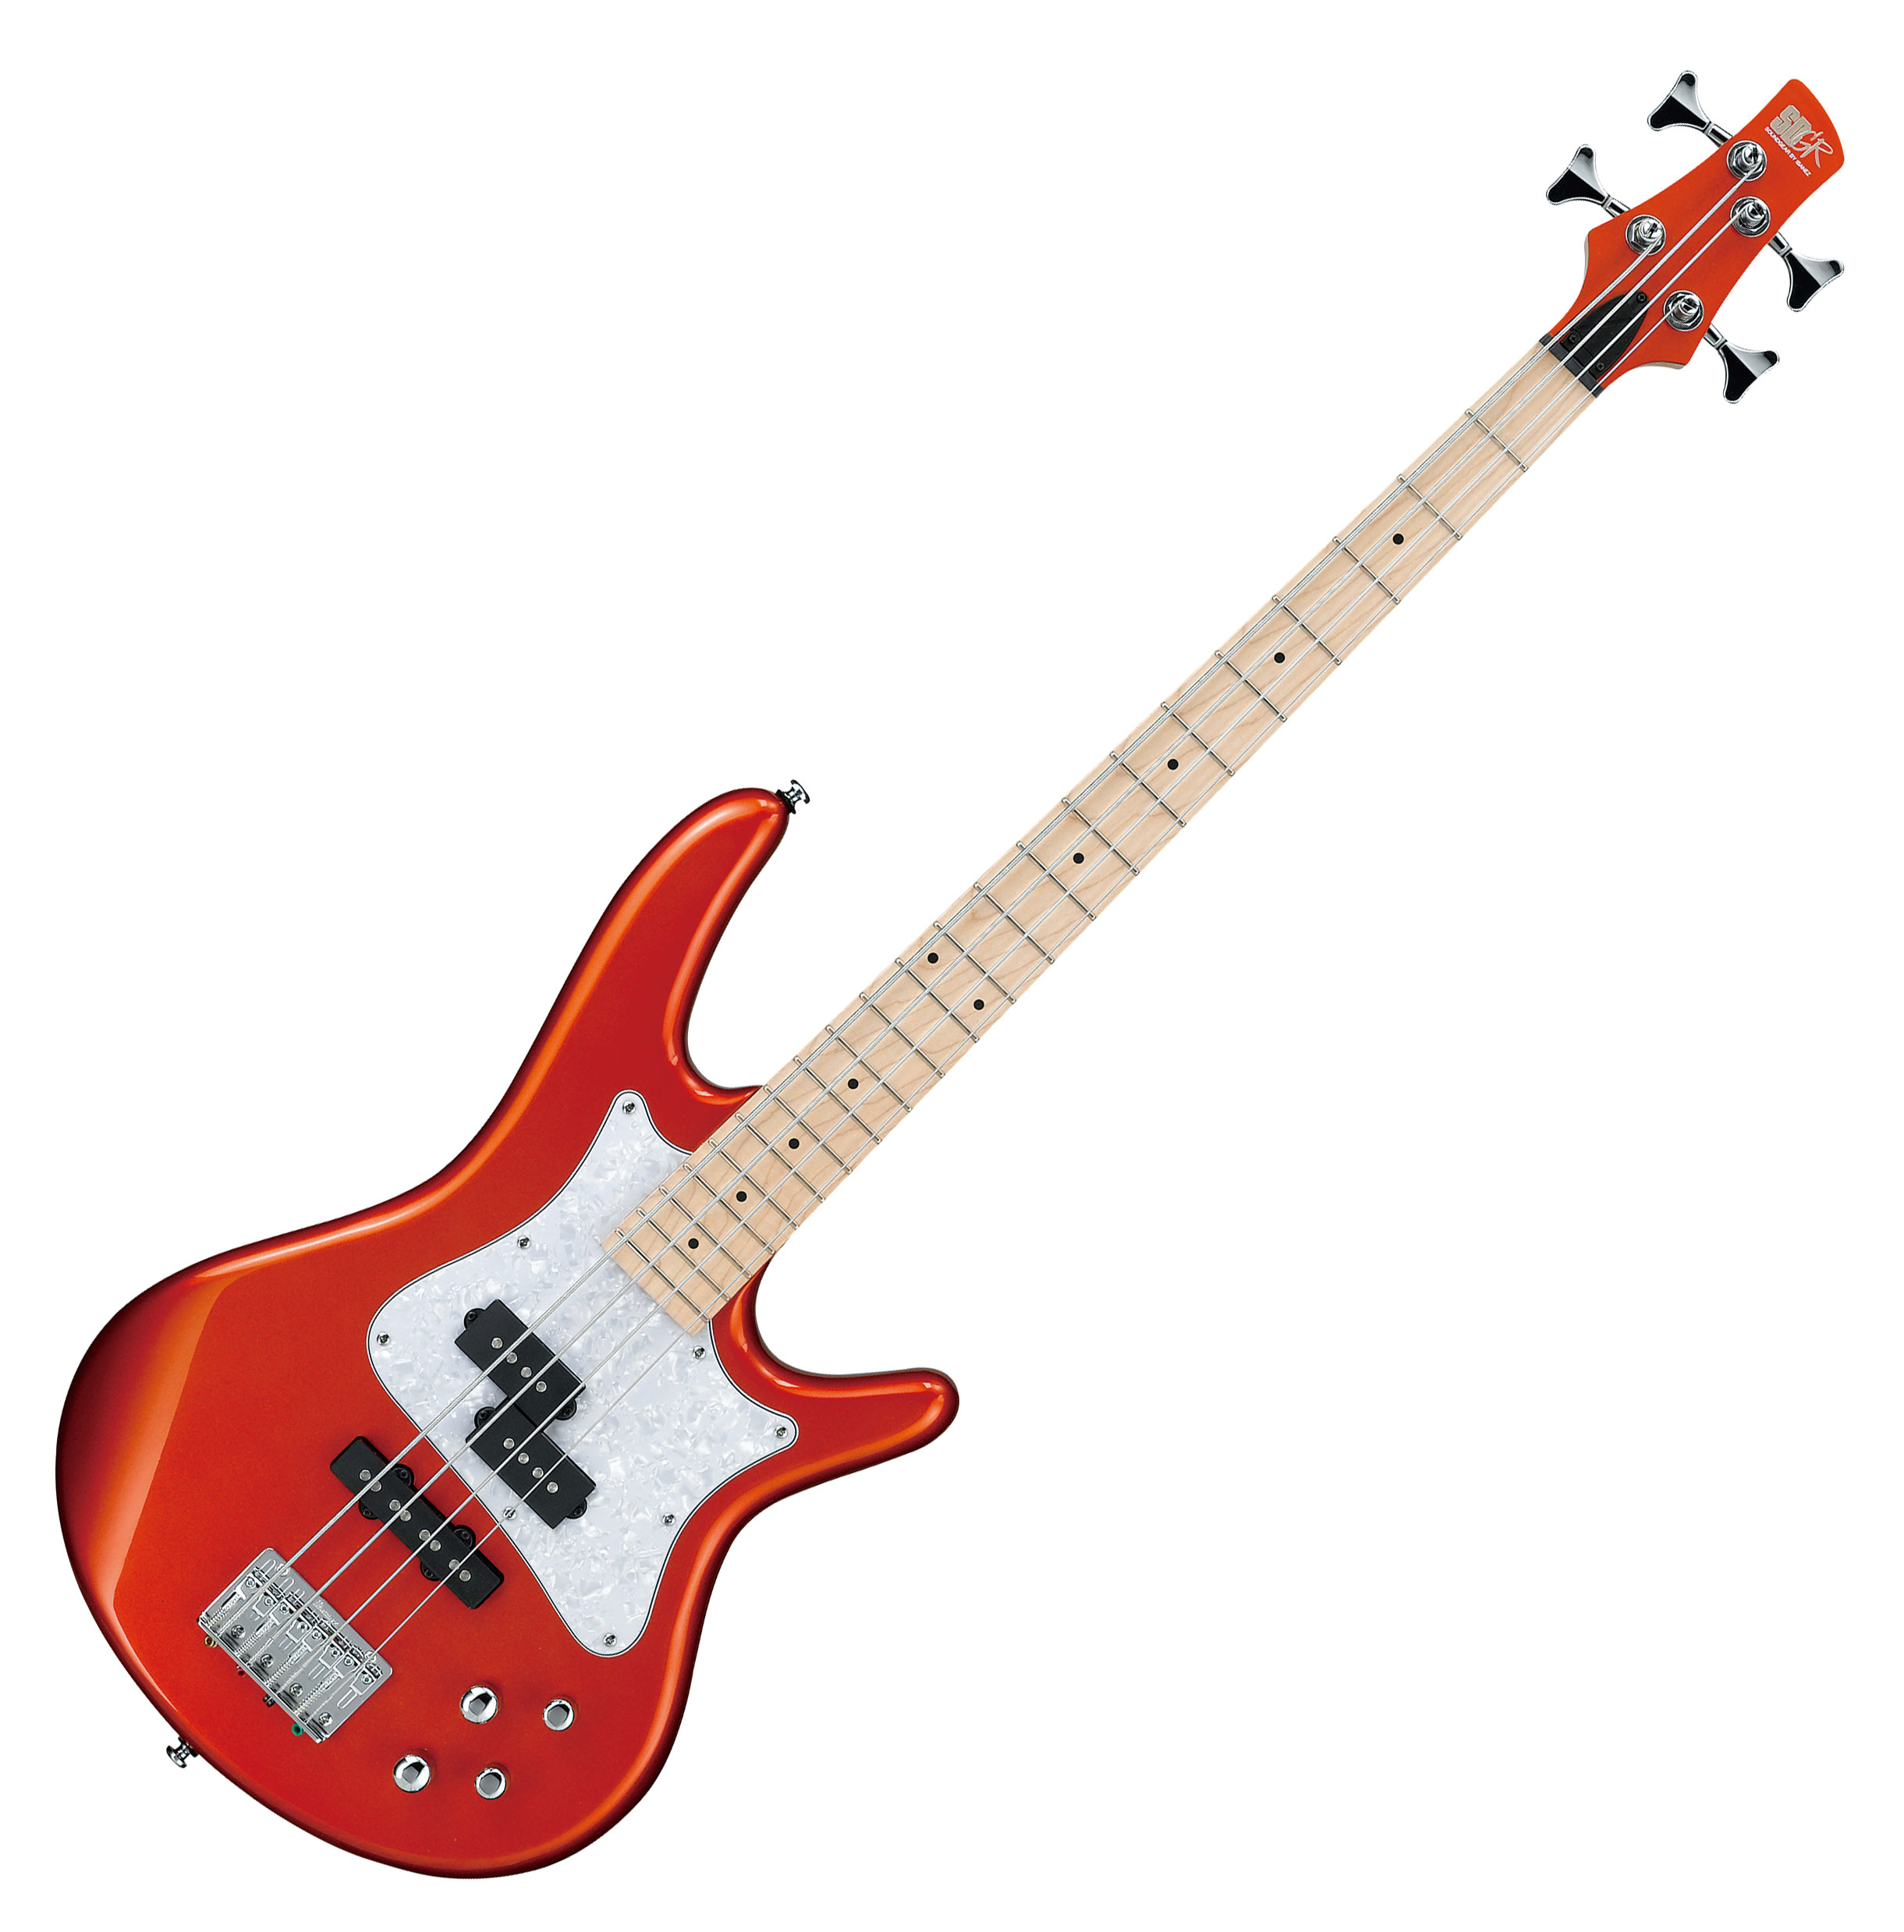 Kindergitarren - Ibanez SRMD200 ROM - Onlineshop Musikhaus Kirstein